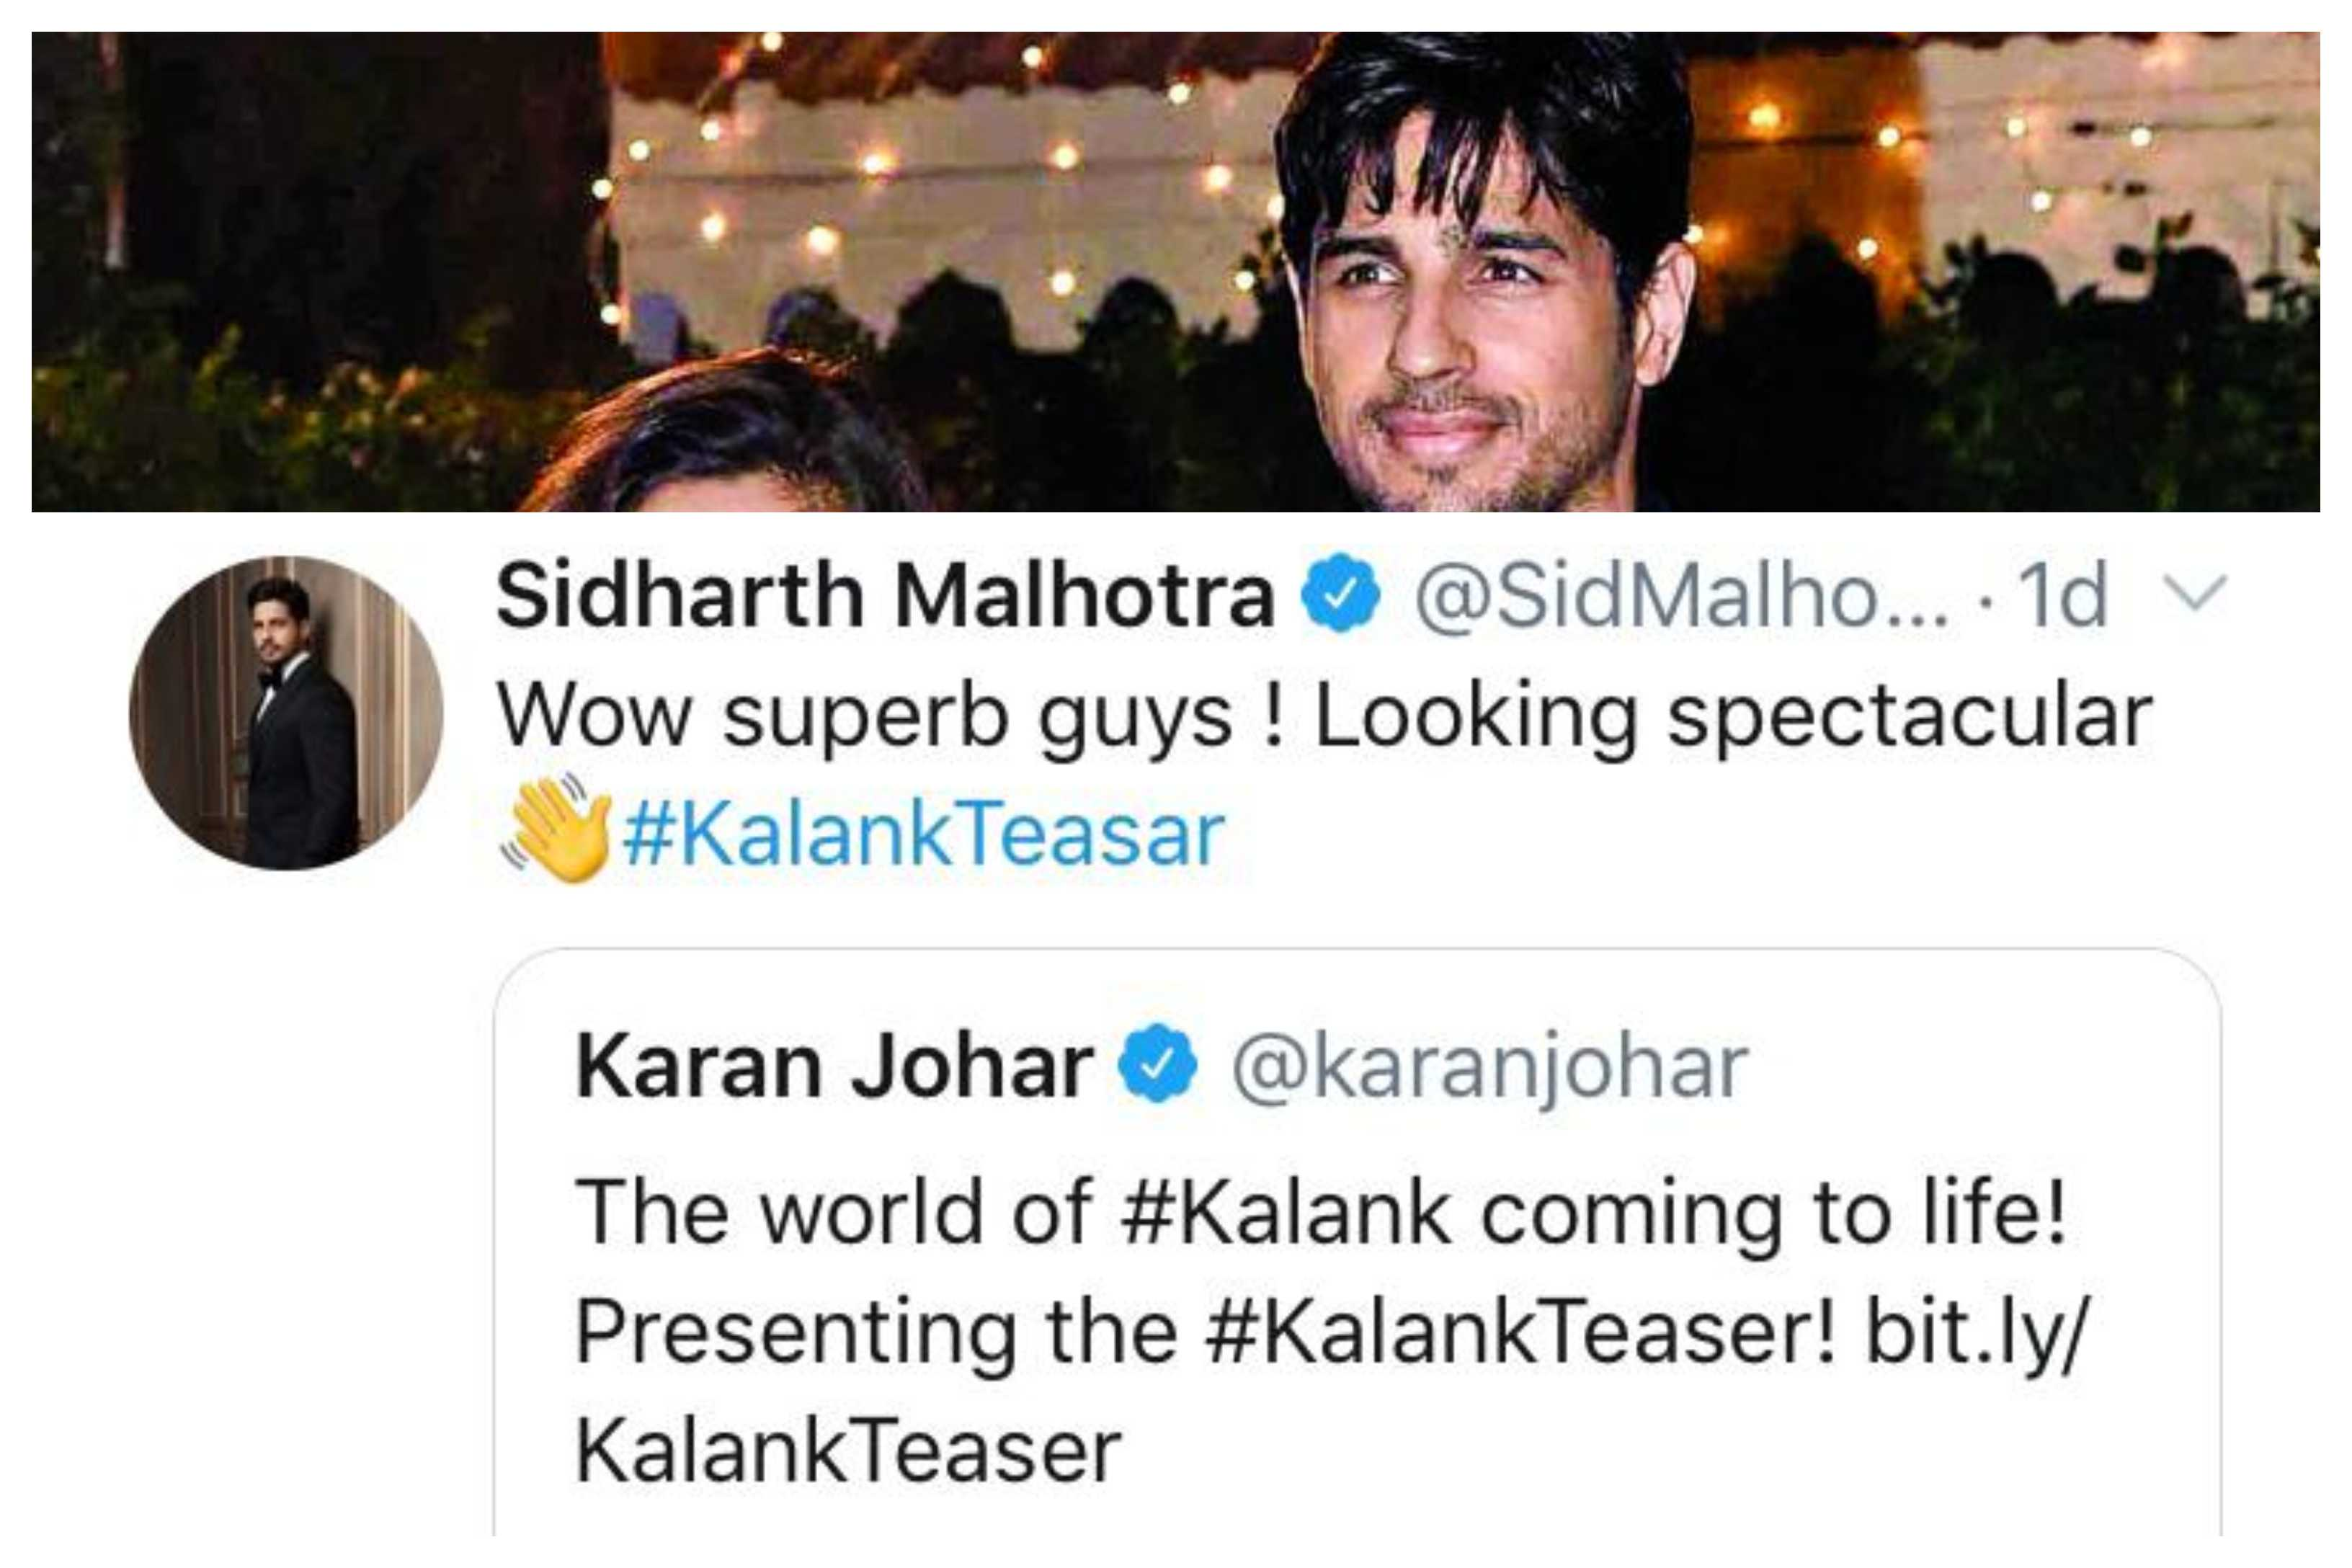 Sidharth Malhotra reaction on Kalank teaser